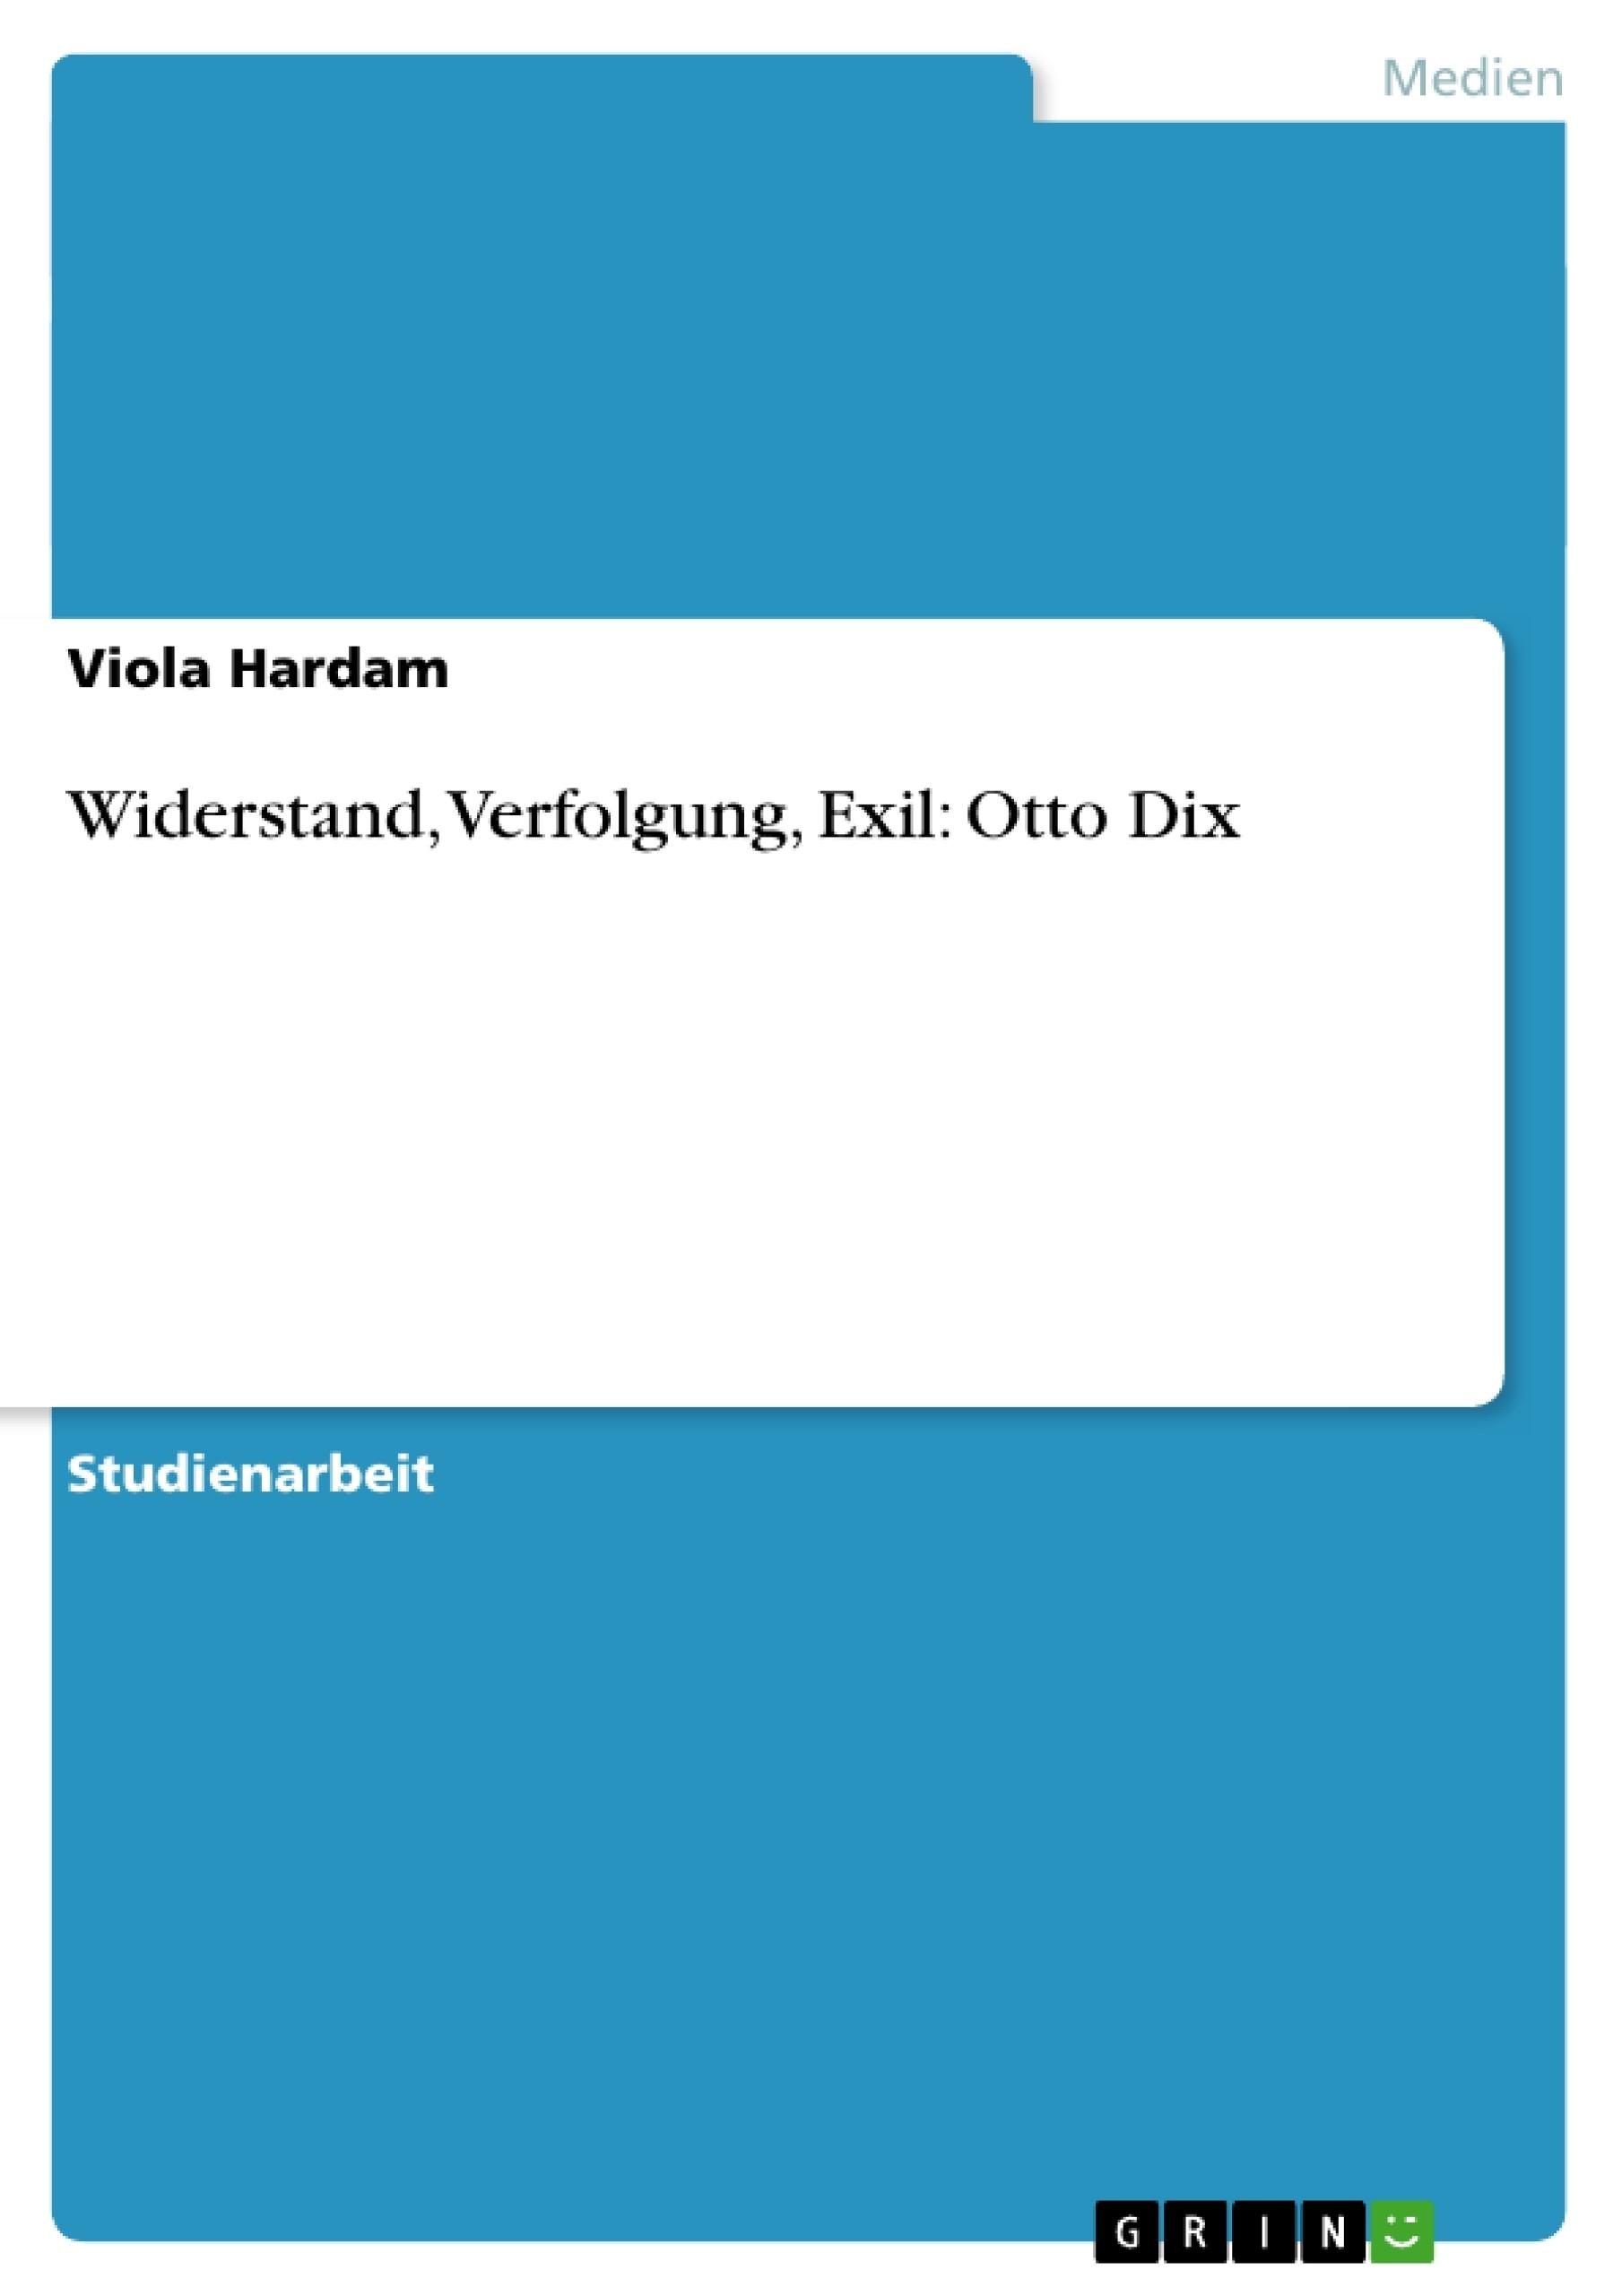 Titel: Widerstand, Verfolgung, Exil: Otto Dix